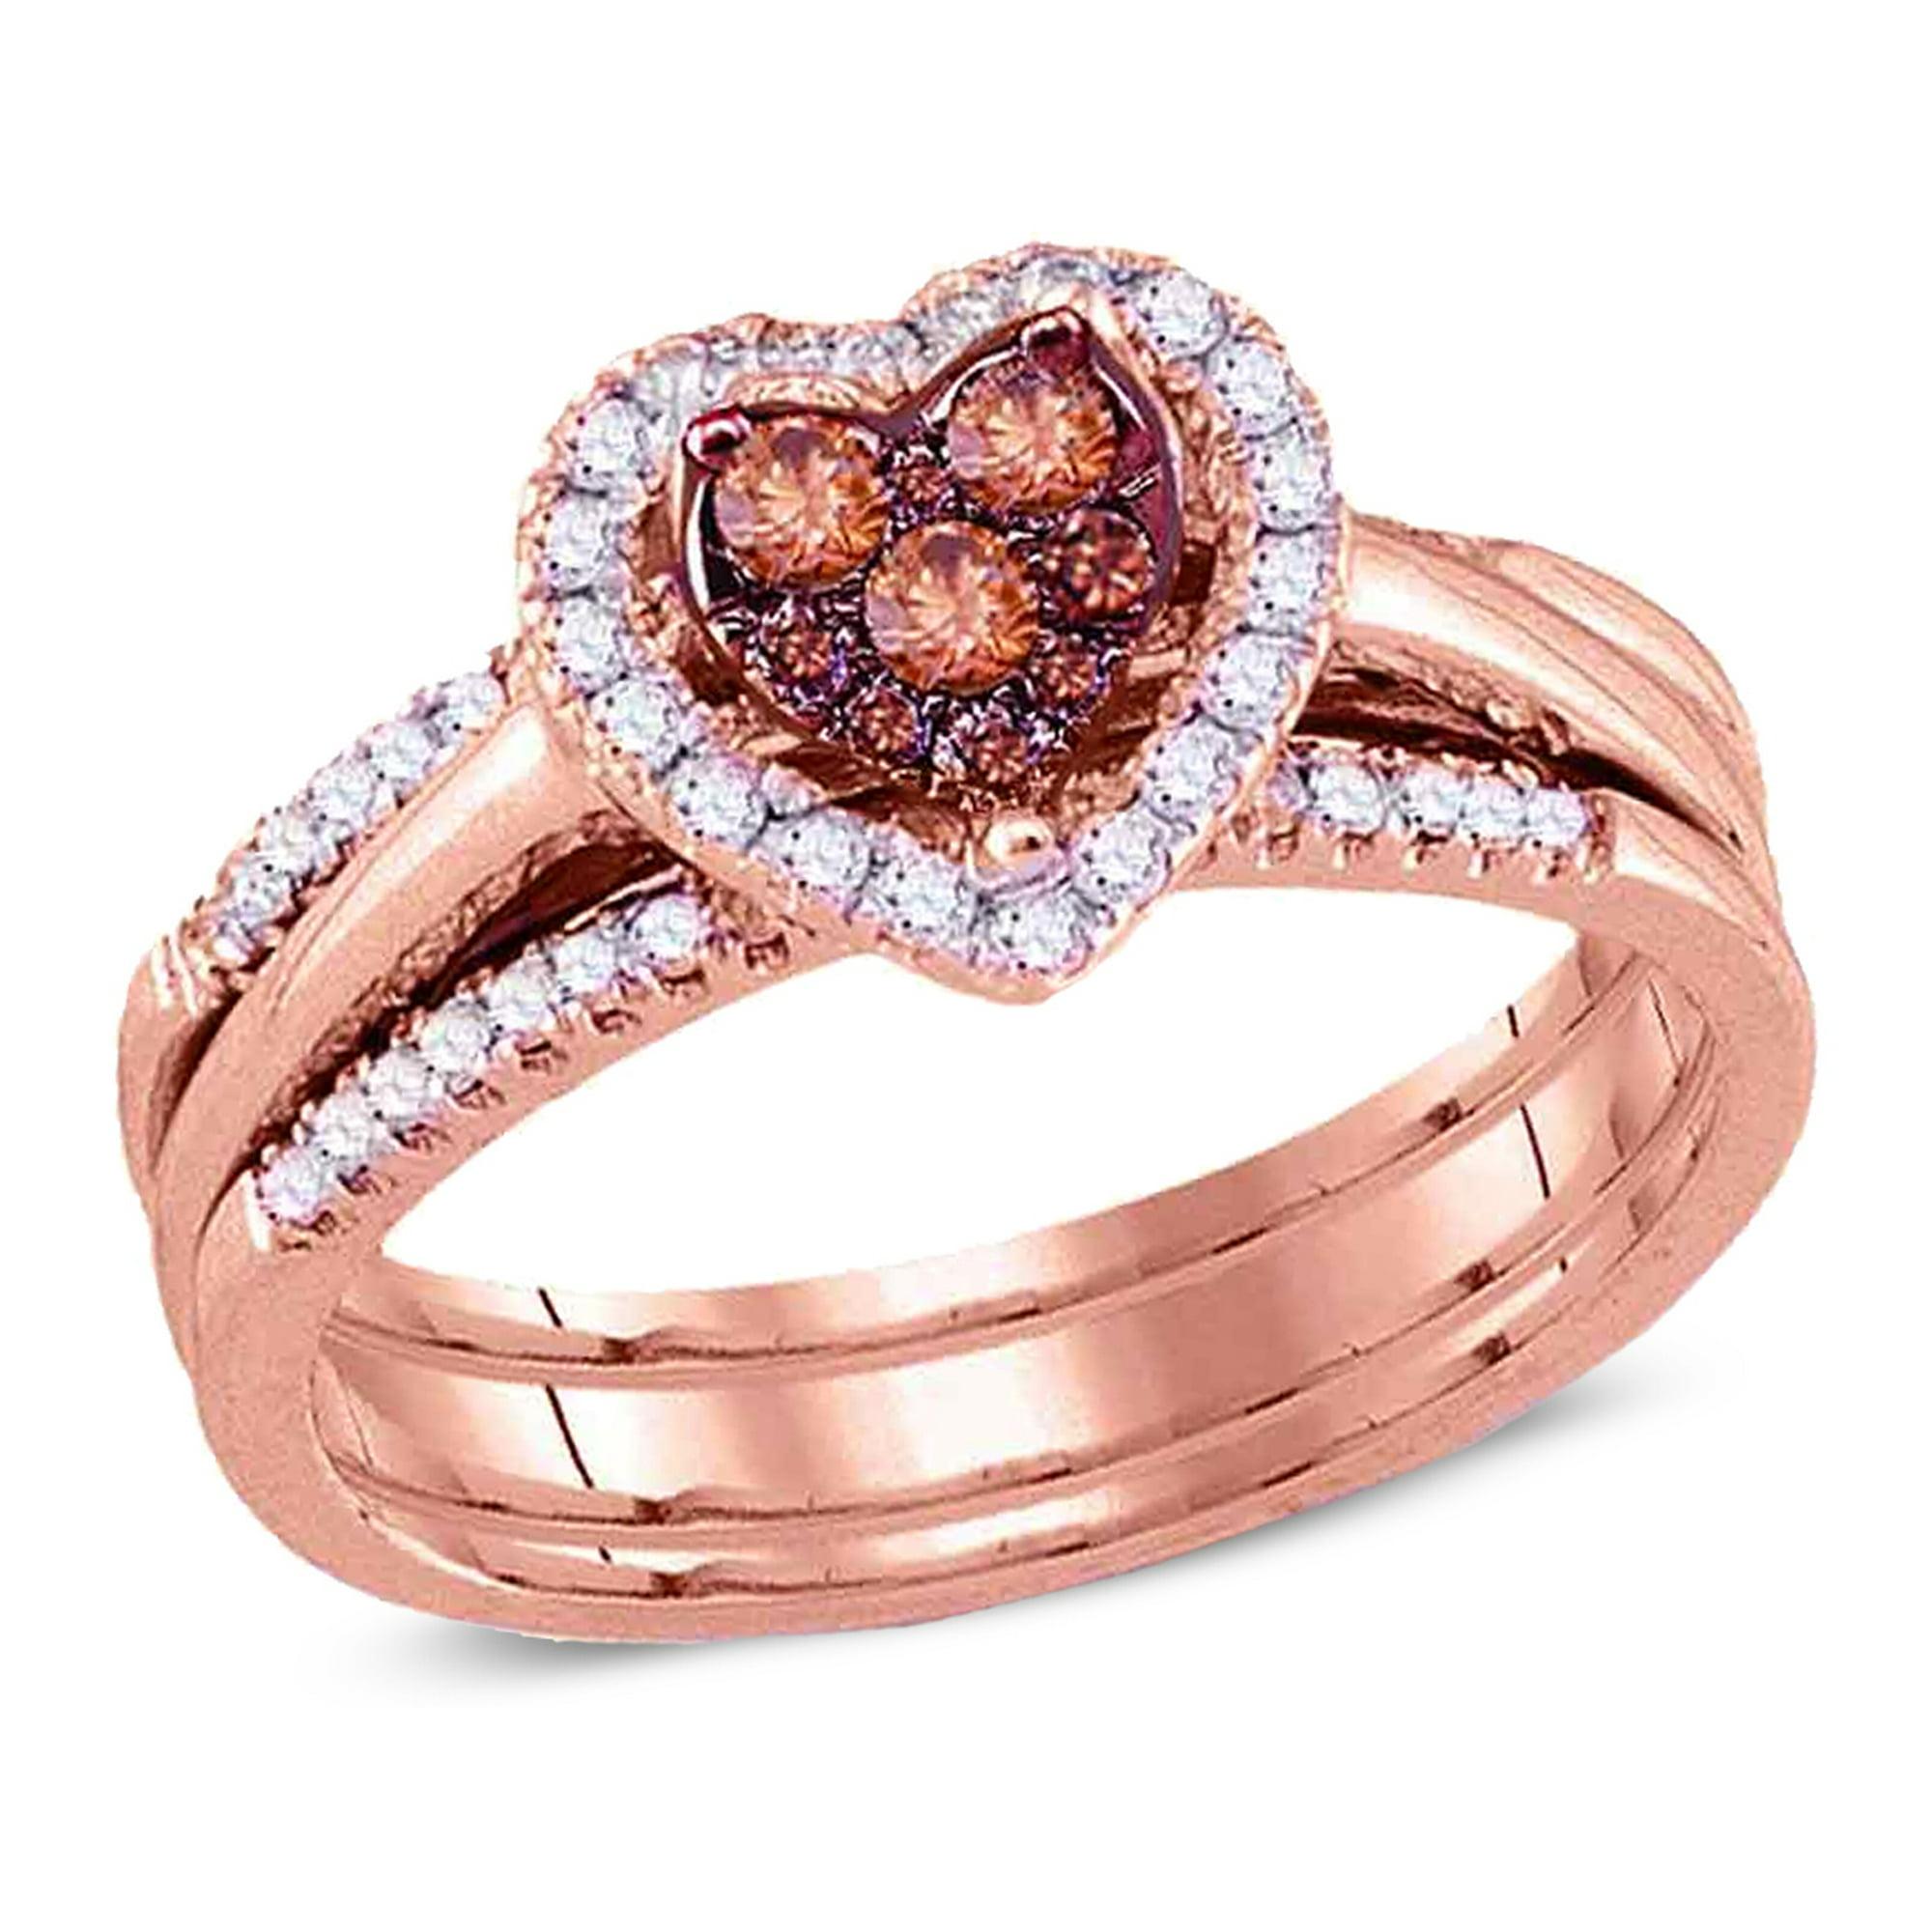 1 2 Carat I1 I2 Champagne Cognac Diamond Heart Engagement Ring